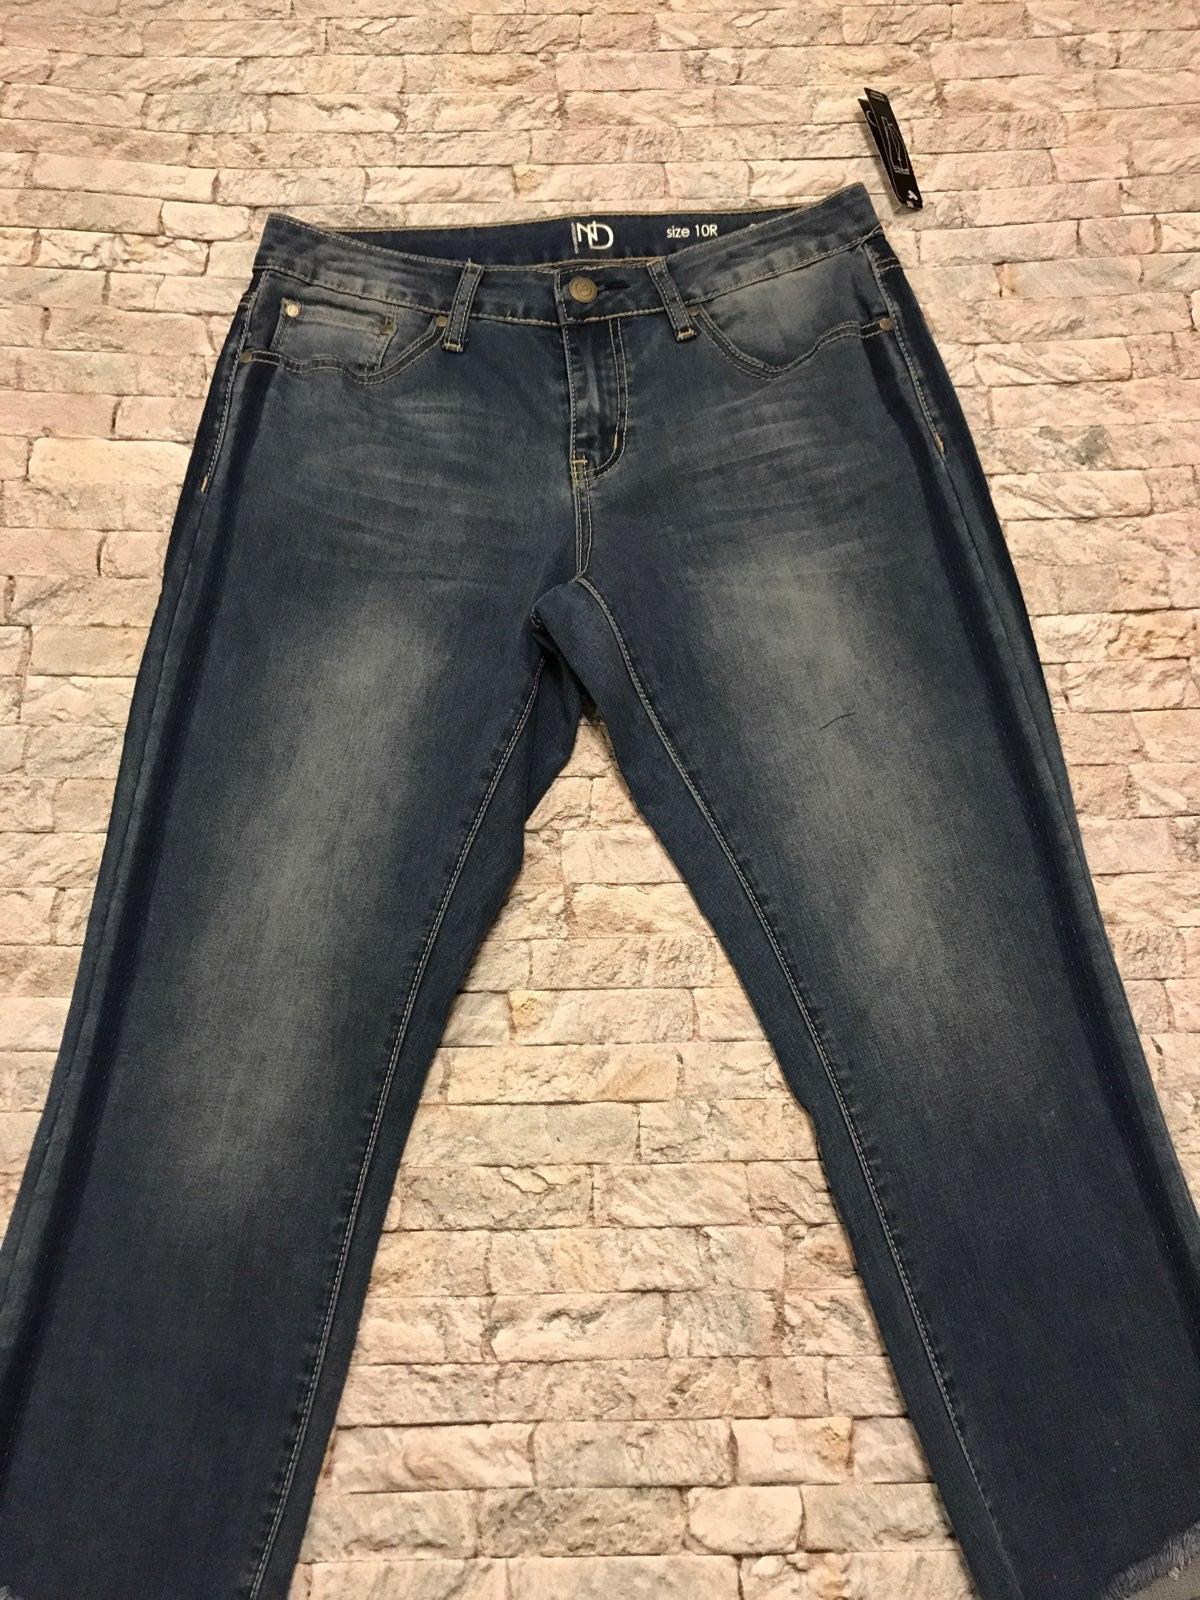 Ladies Size 10 Crop New Direction